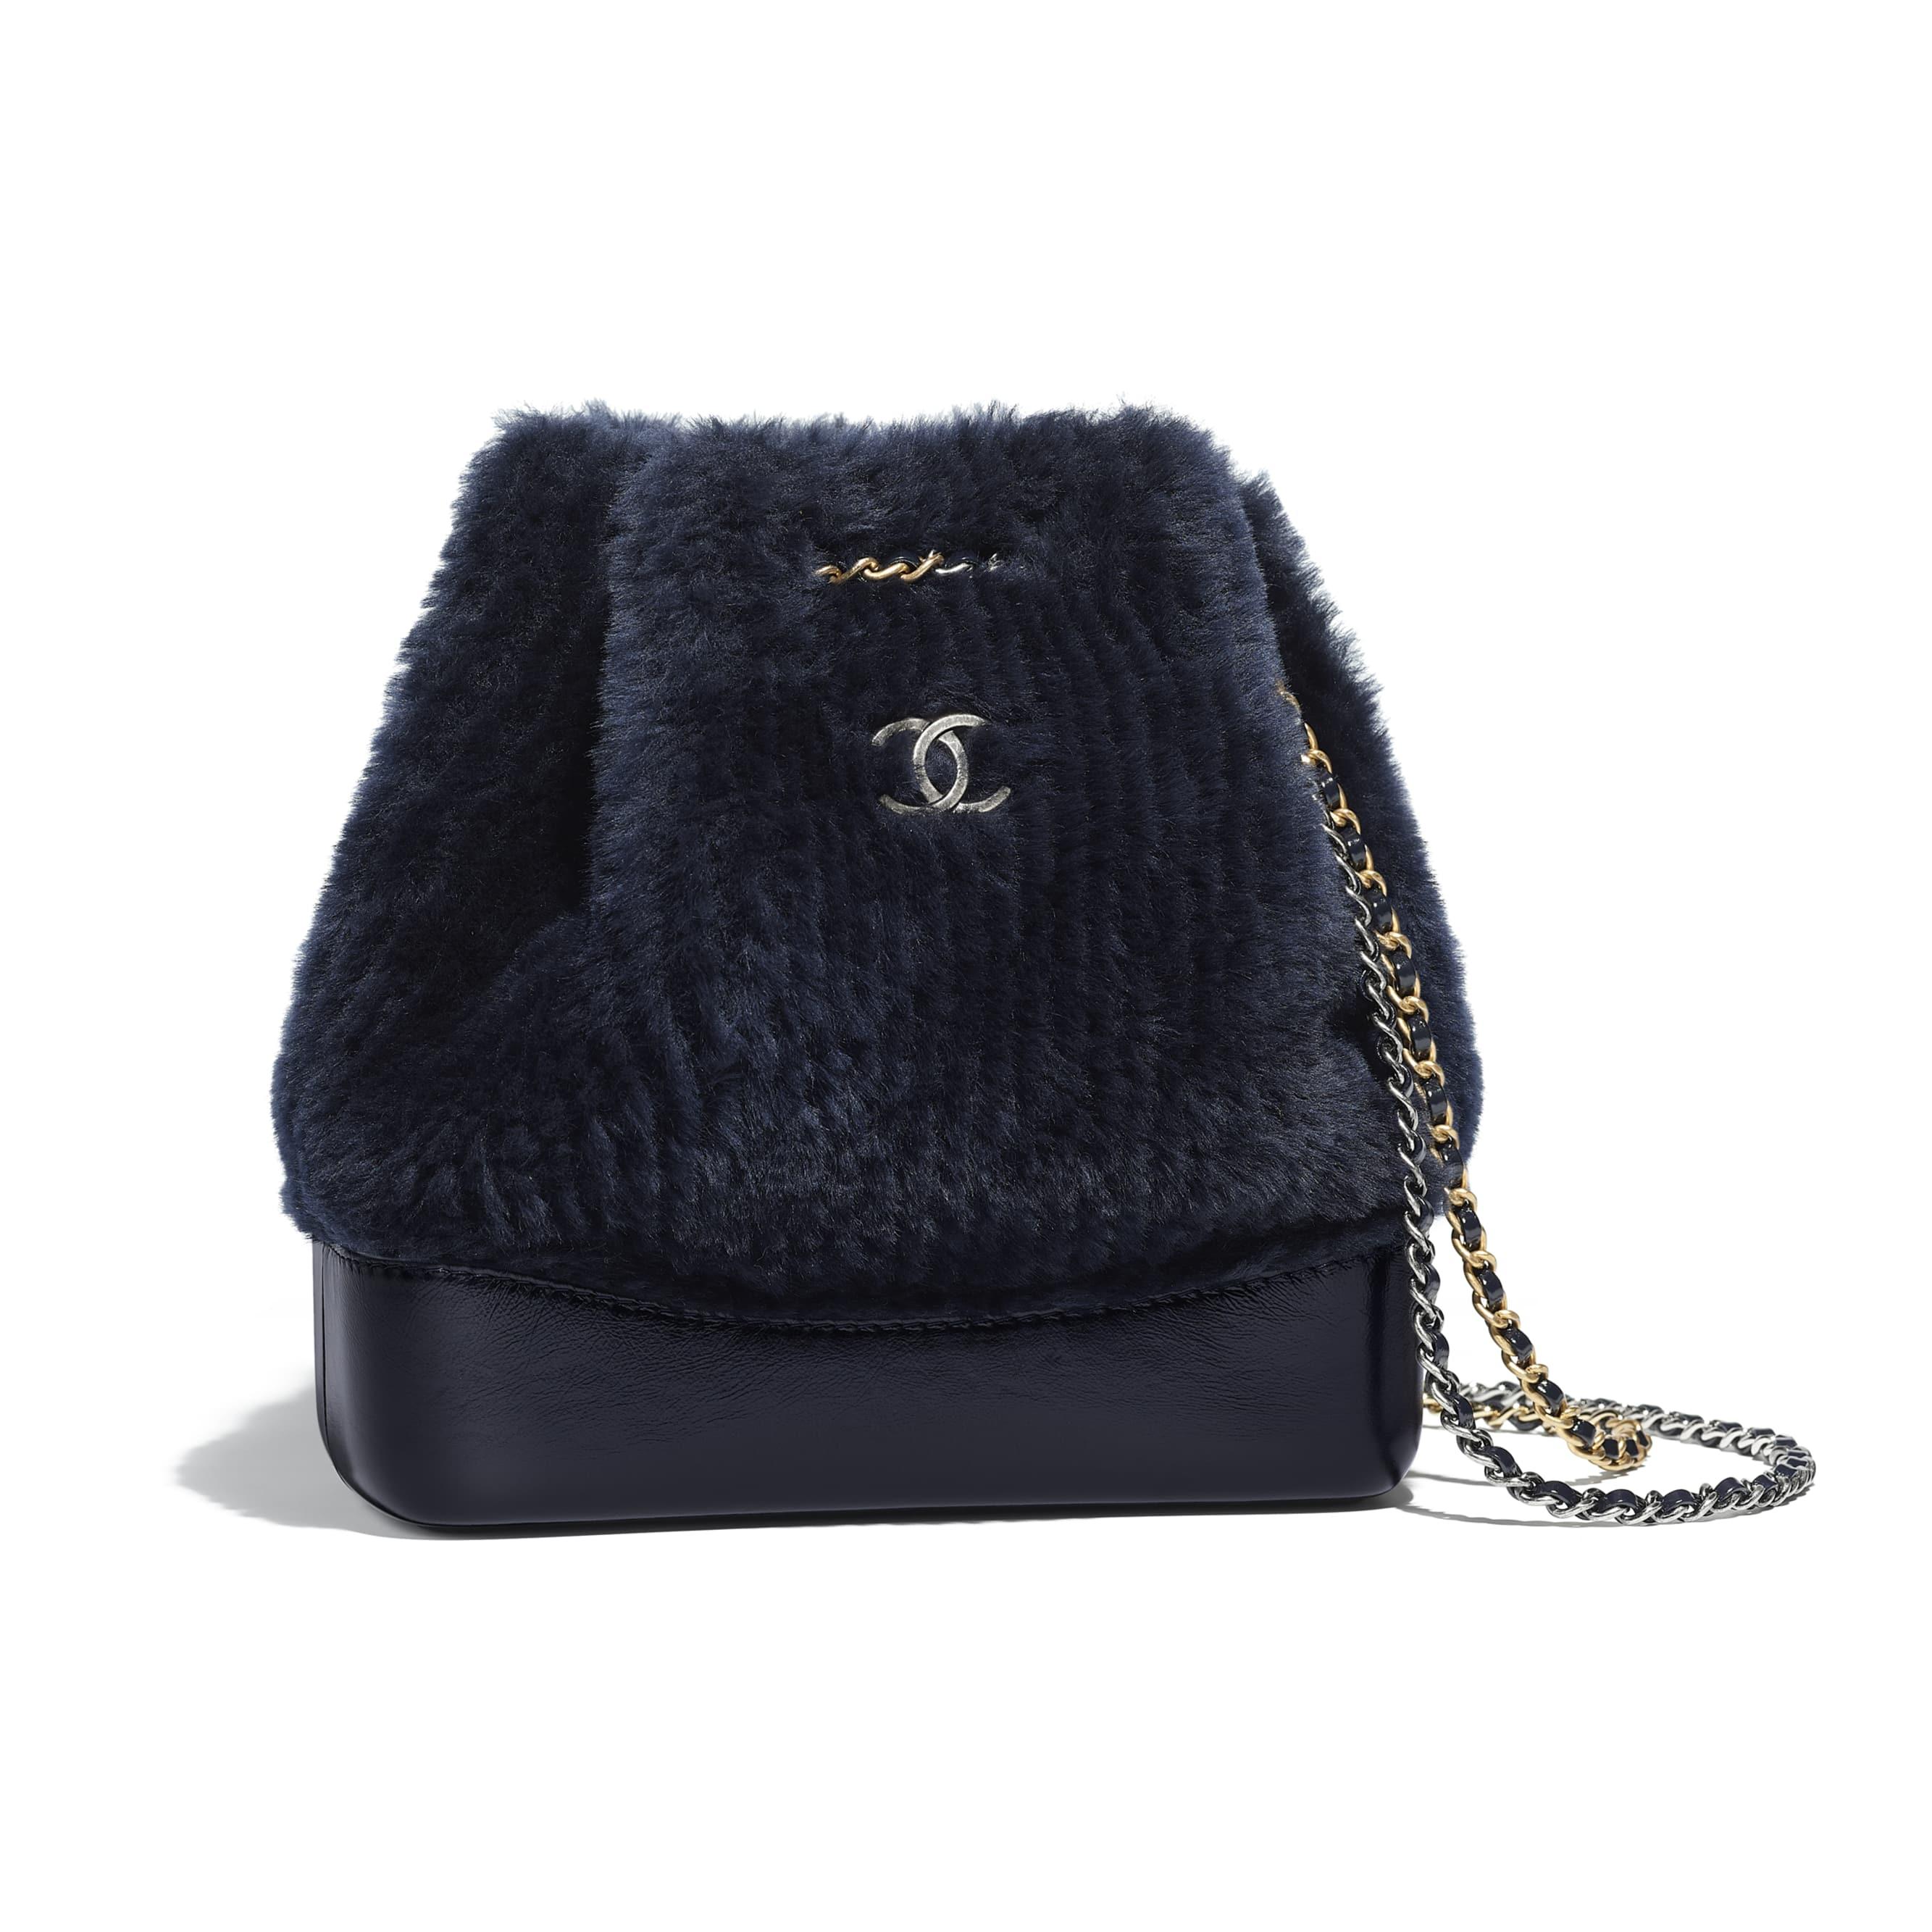 a1f8fe54721 chanel -s-gabrielle-small-backpack-navy-blue-shearling-sheepskin-calfskin-silver-tone-gold-tone-metal-packshot-default-a94485y332800b789-8804054892574